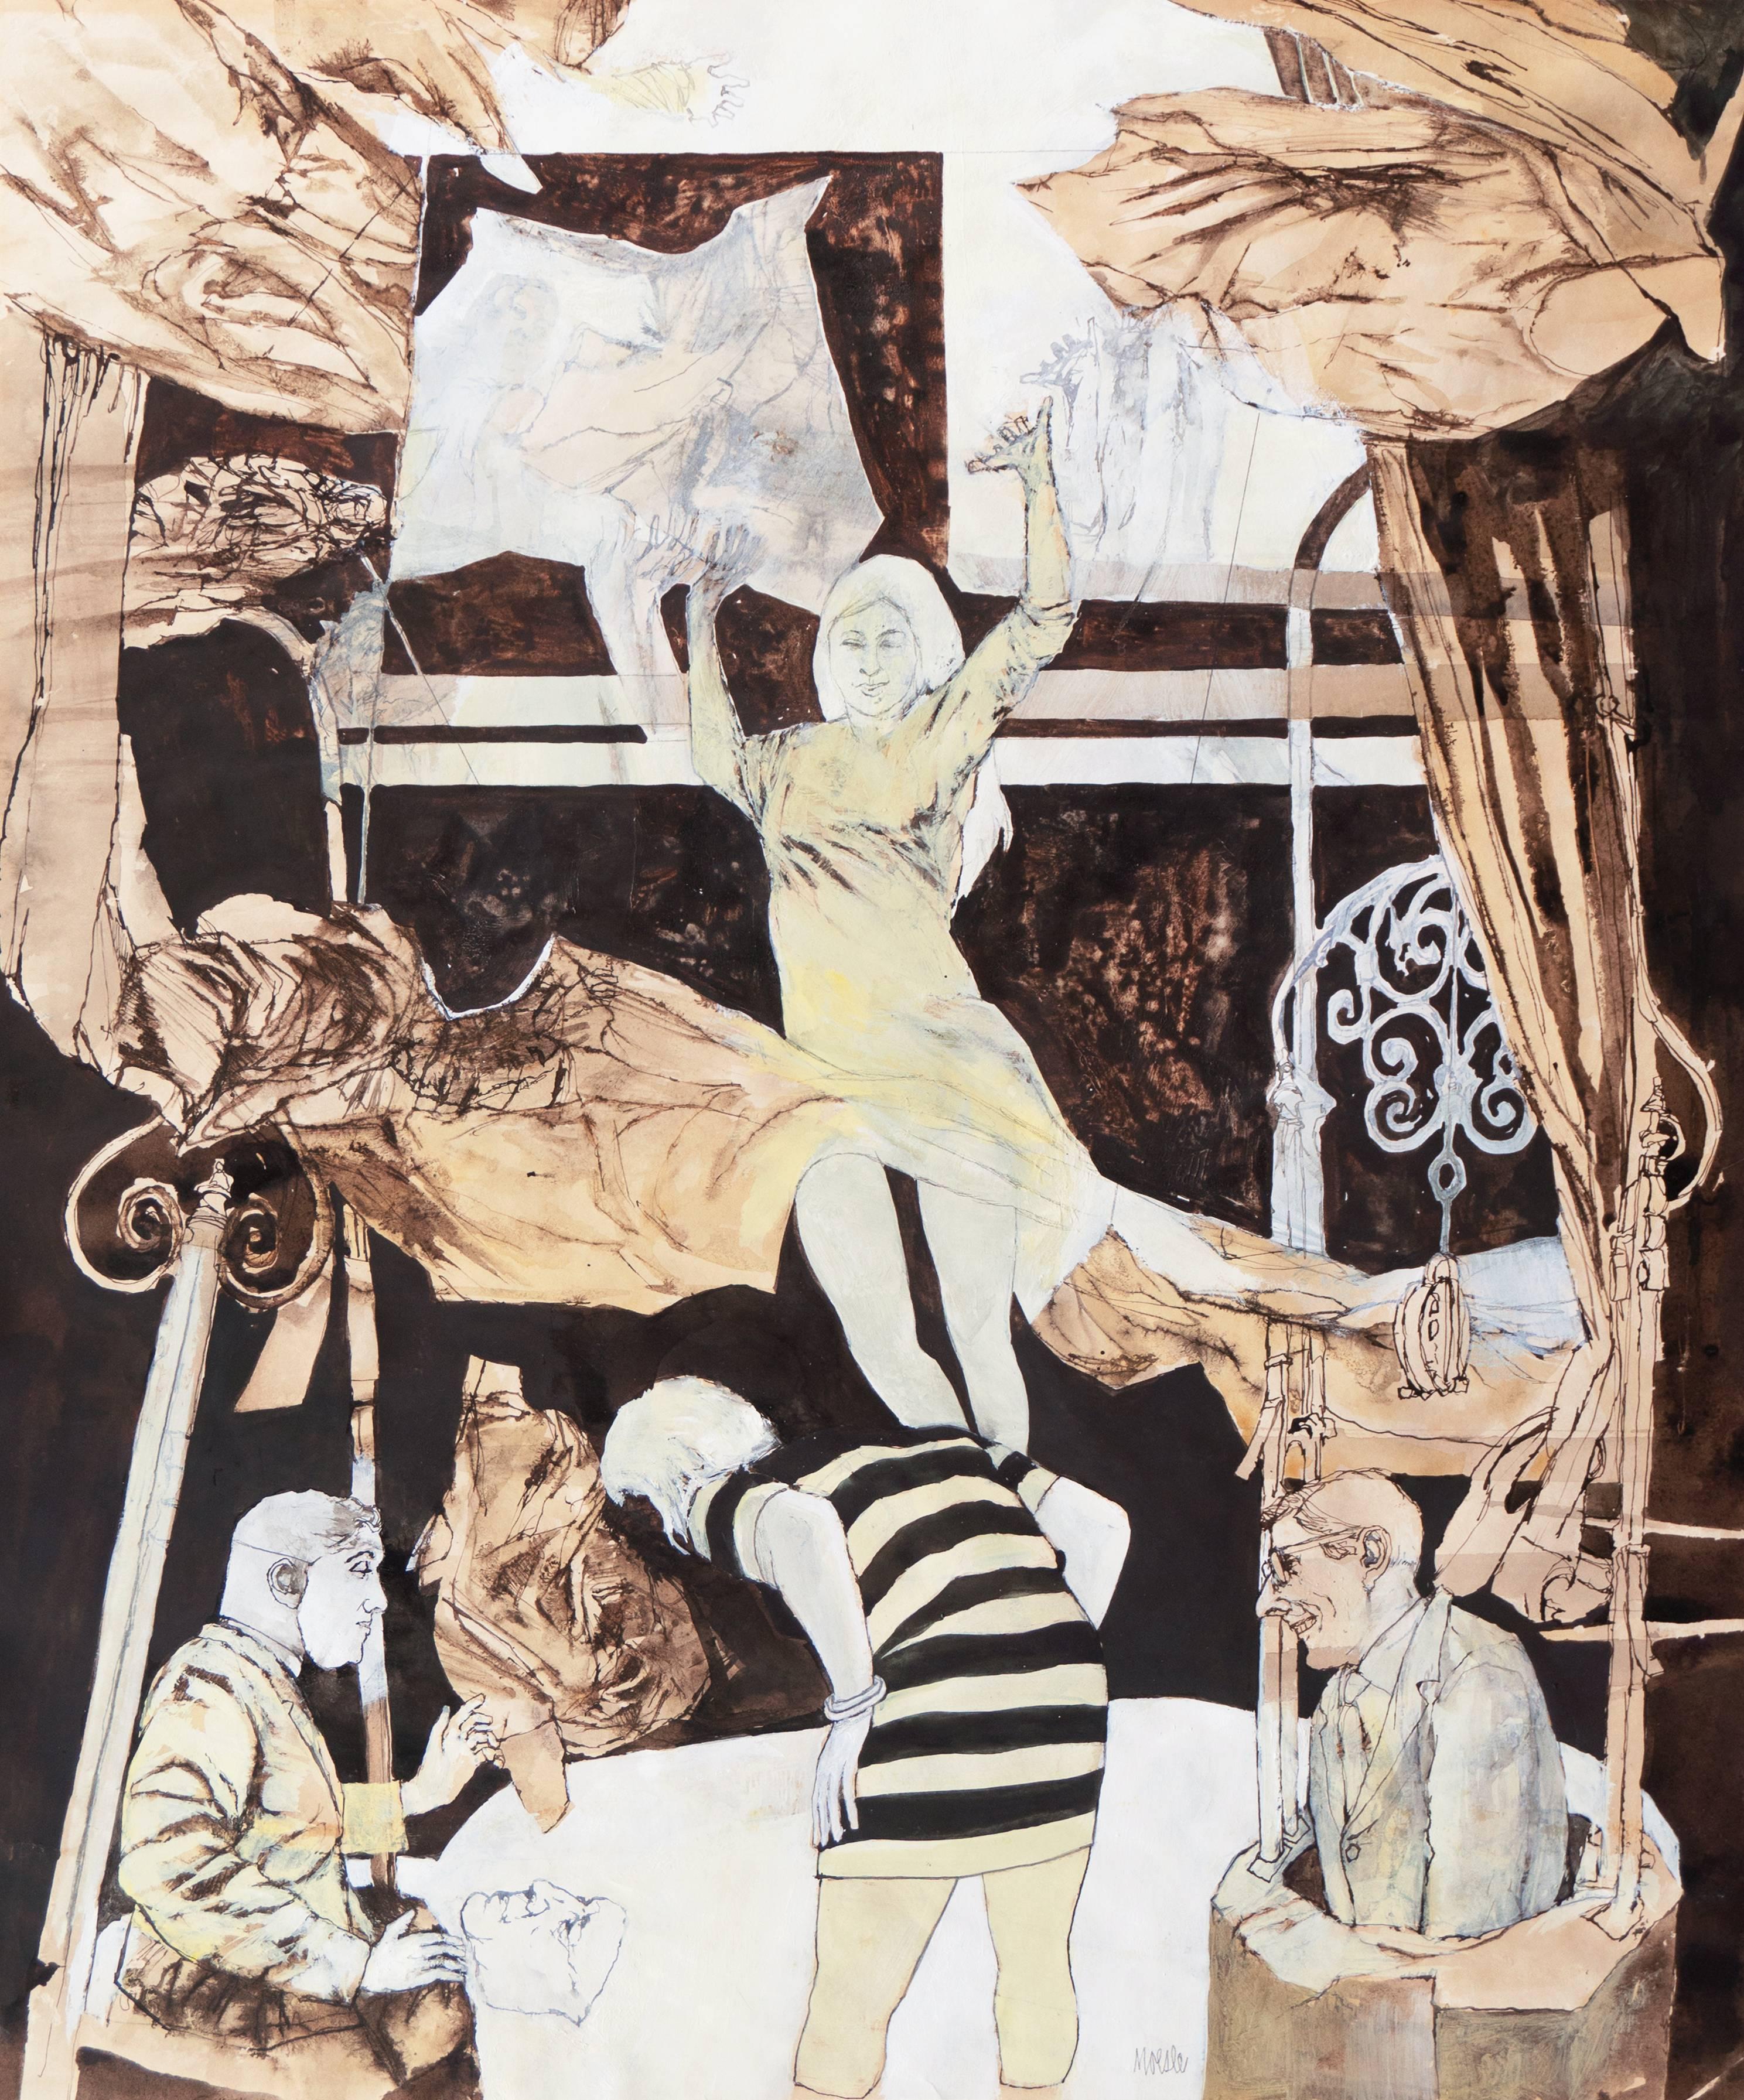 'Dynamic Figurative', California Post-Impressionist, Ruskin School of Art